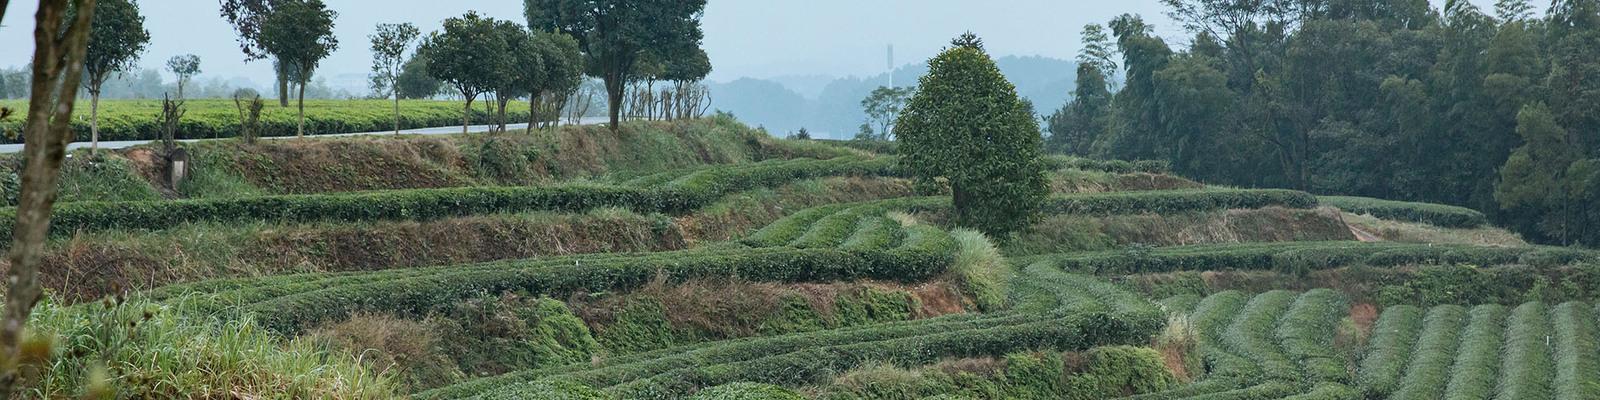 A stepped field of tea